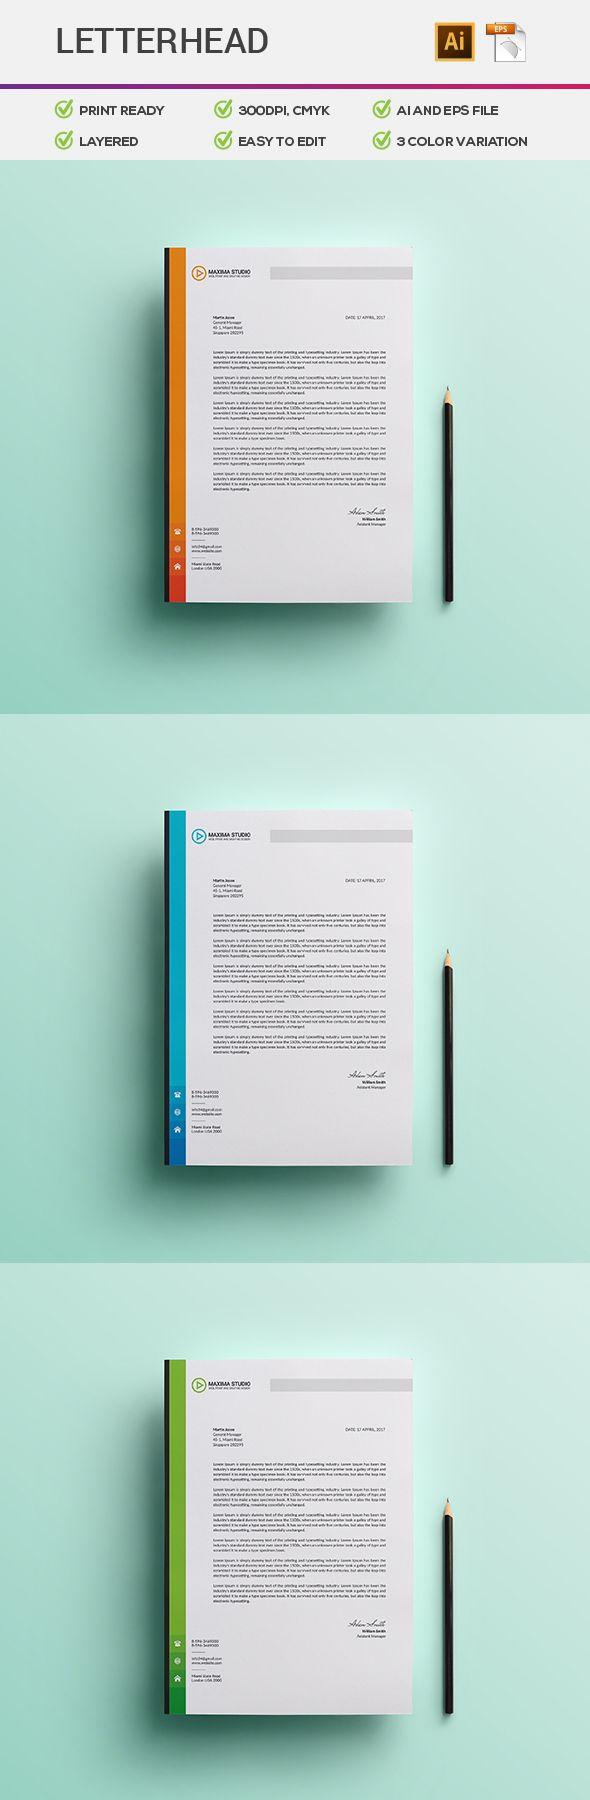 8 best letterhead design images on pinterest letterhead template letterhead design on behance spiritdancerdesigns Choice Image